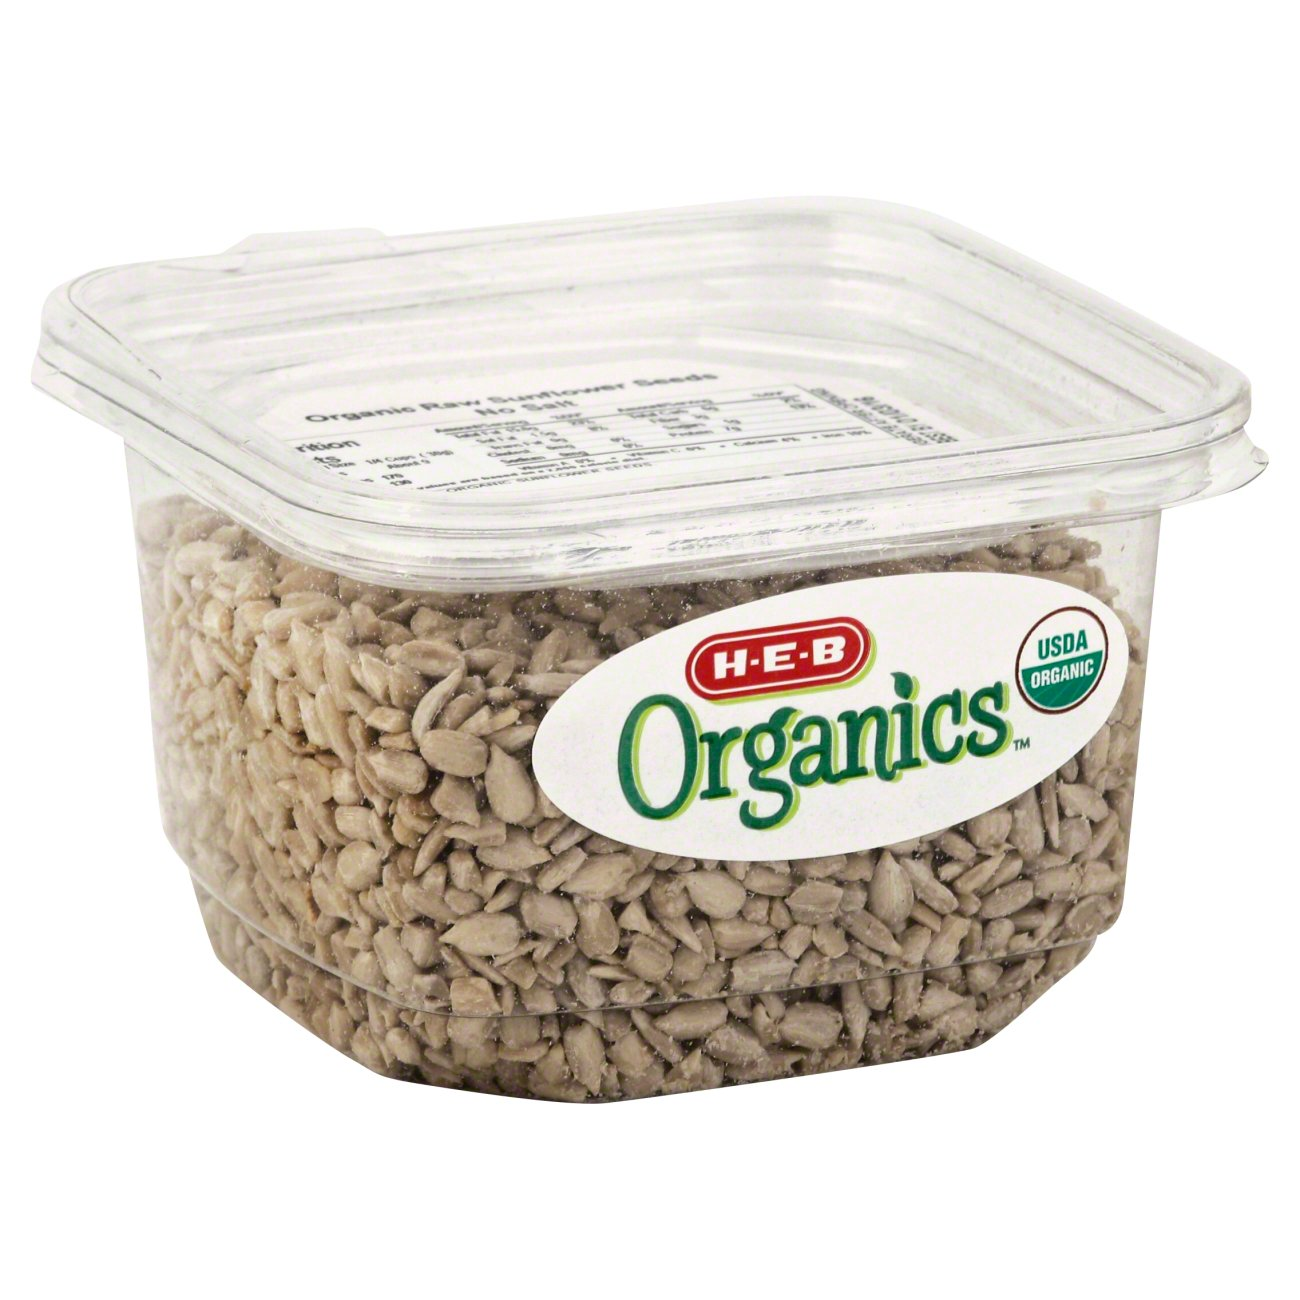 H-E-B Organics Raw Sunflower Seeds, Unsalted - Shop Nuts ...